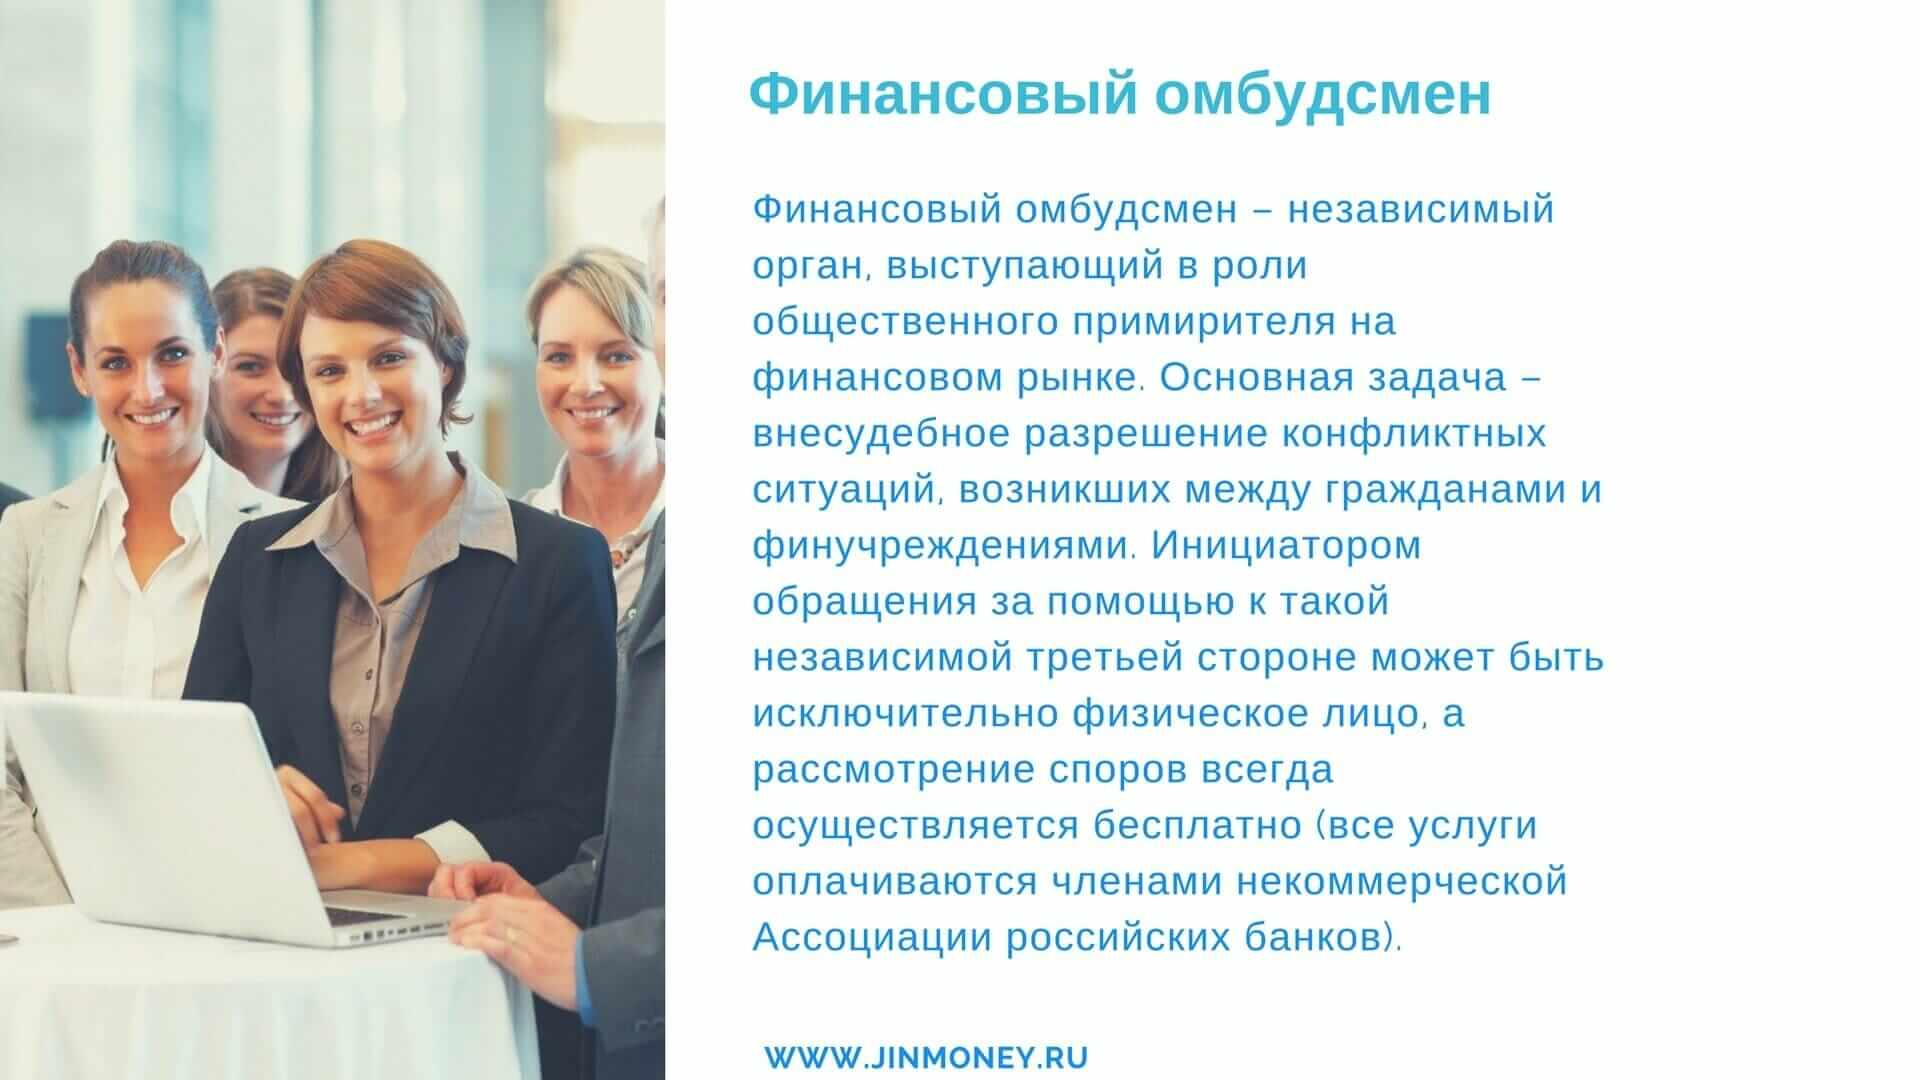 институт финансового омбудсмена